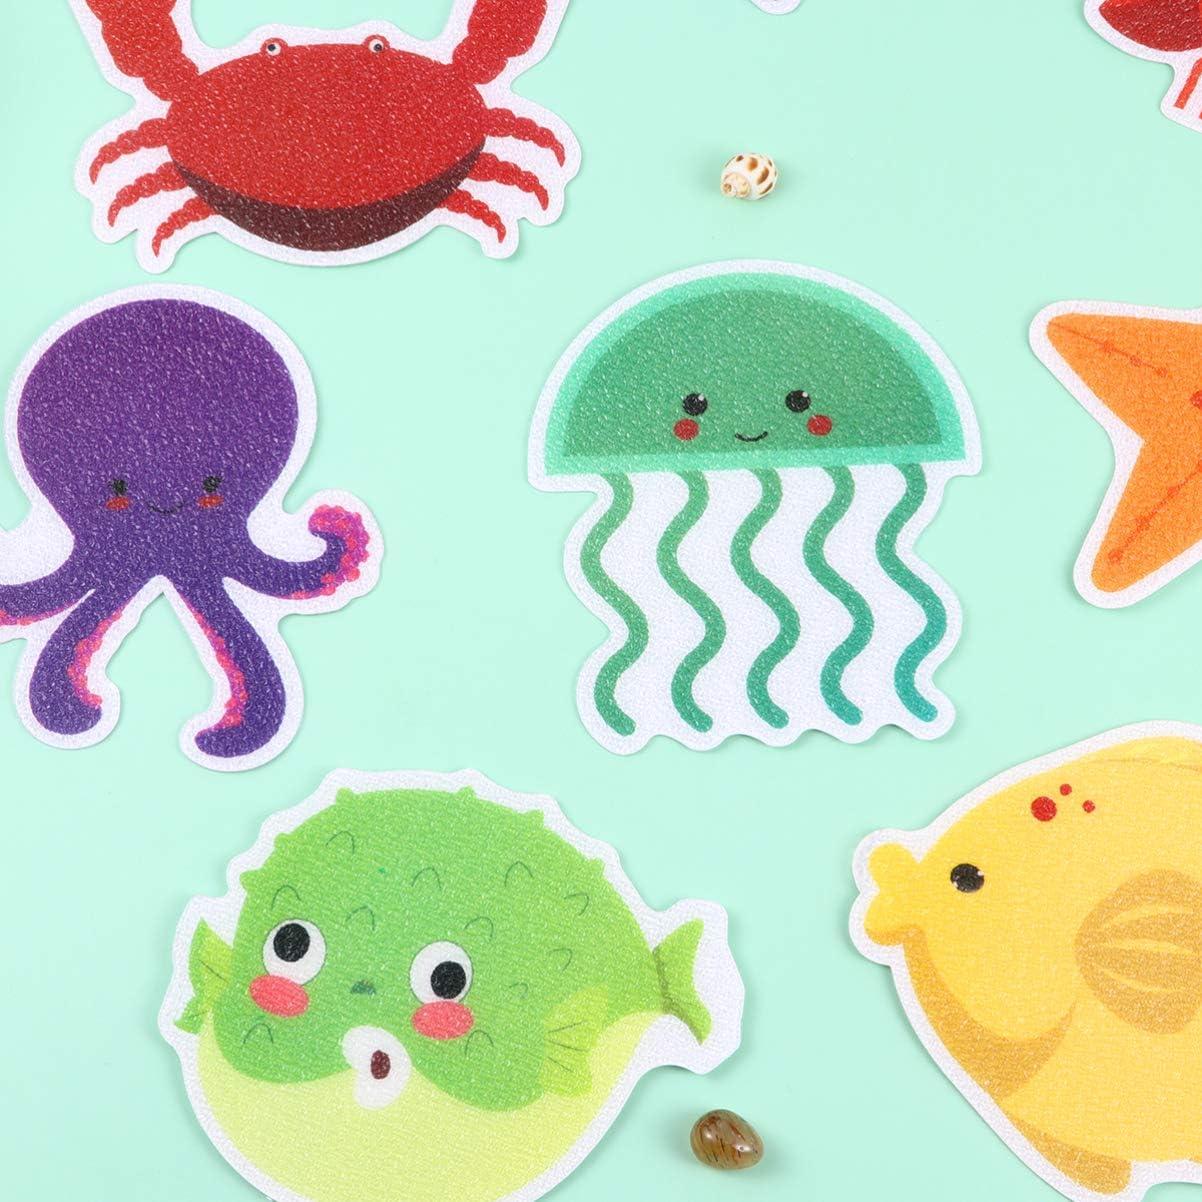 TOPBATHY Bathtub Stickers Non Slip Shower Treads Adhesive Appliques Clownfish Sea Creature Shower Strips Cartoon Prevent Slippery Surfaces Bathroom Toilet 20pcs